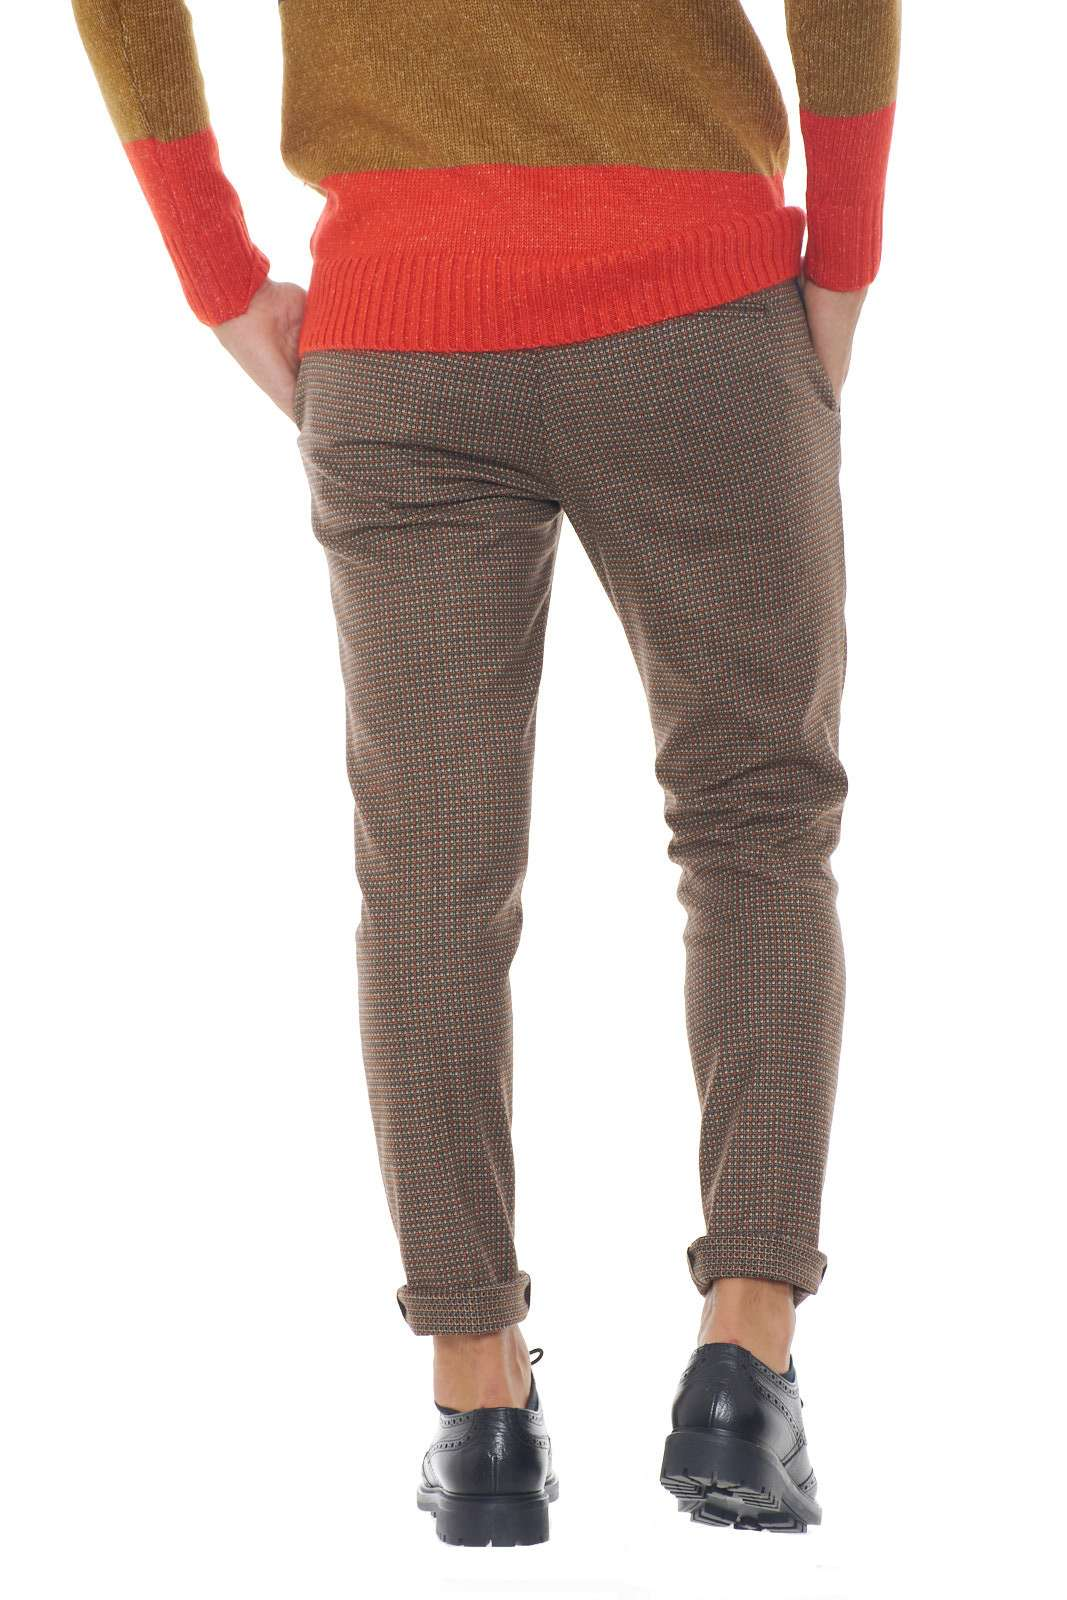 https://www.parmax.com/media/catalog/product/a/i/AI-outlet_parmax-pantaloni-uomo-Desica-FURORE%20CM%2004-C.jpg